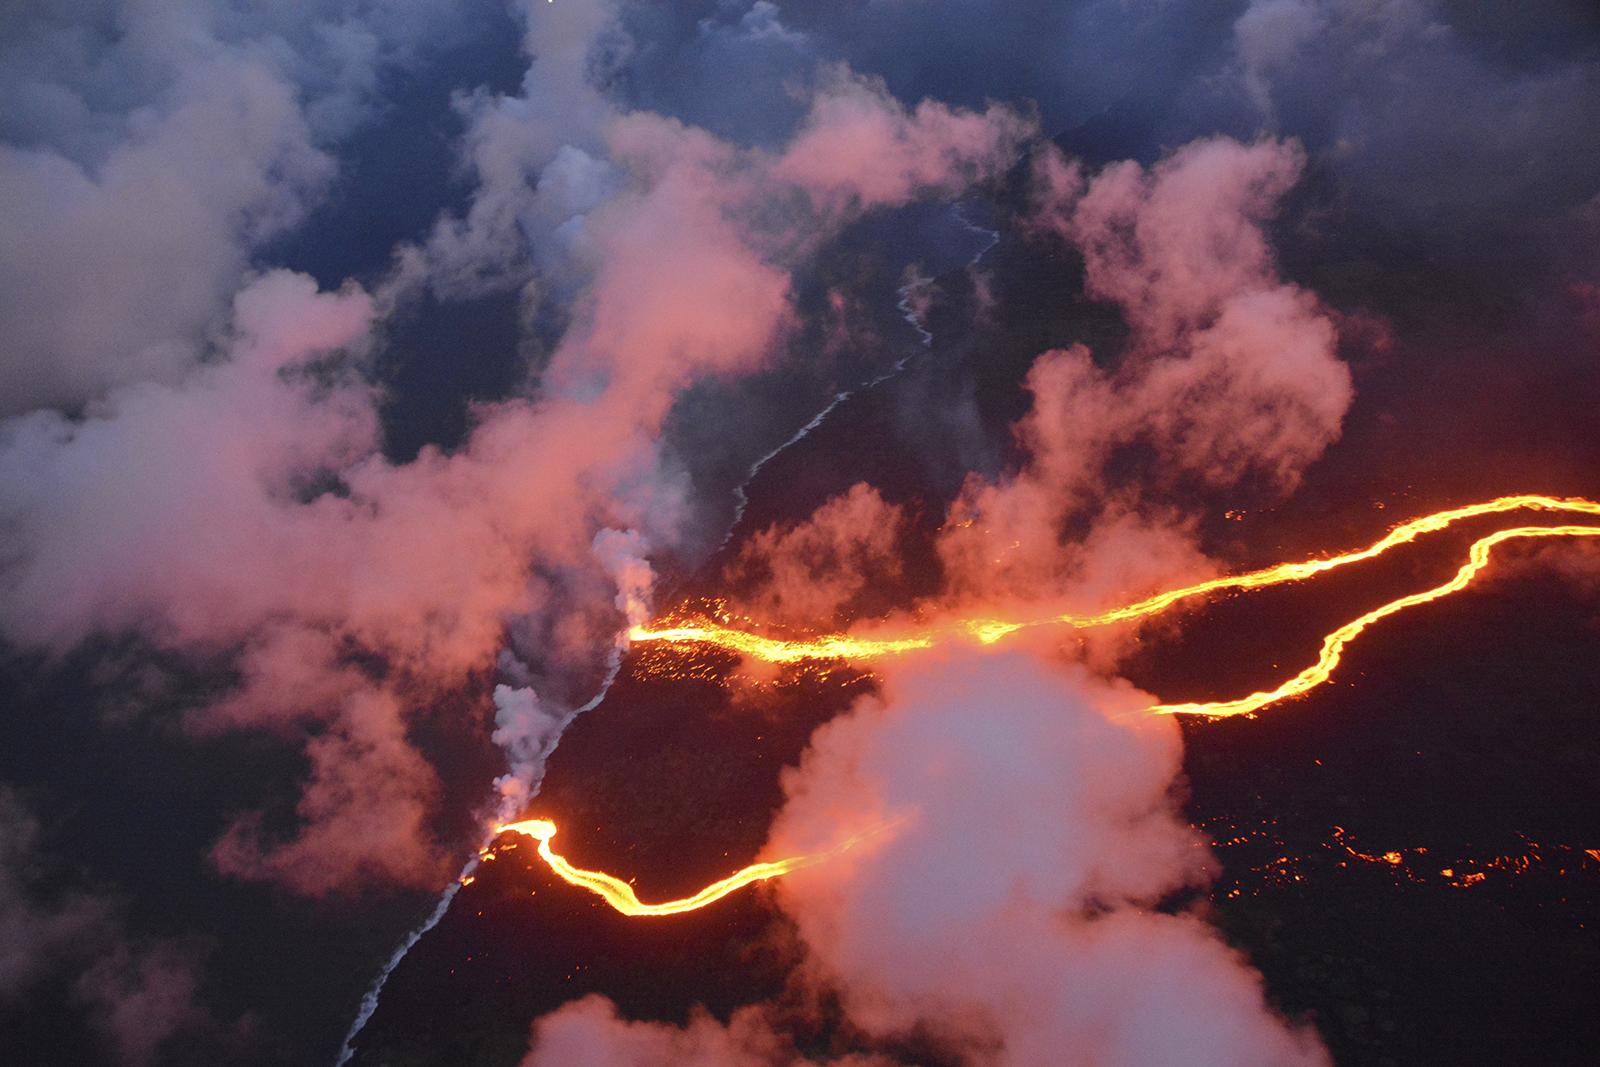 https://qz.com/wp-content/uploads/2018/05/hawaii_volcano_18.jpg?quality=80&strip=all&w=1600